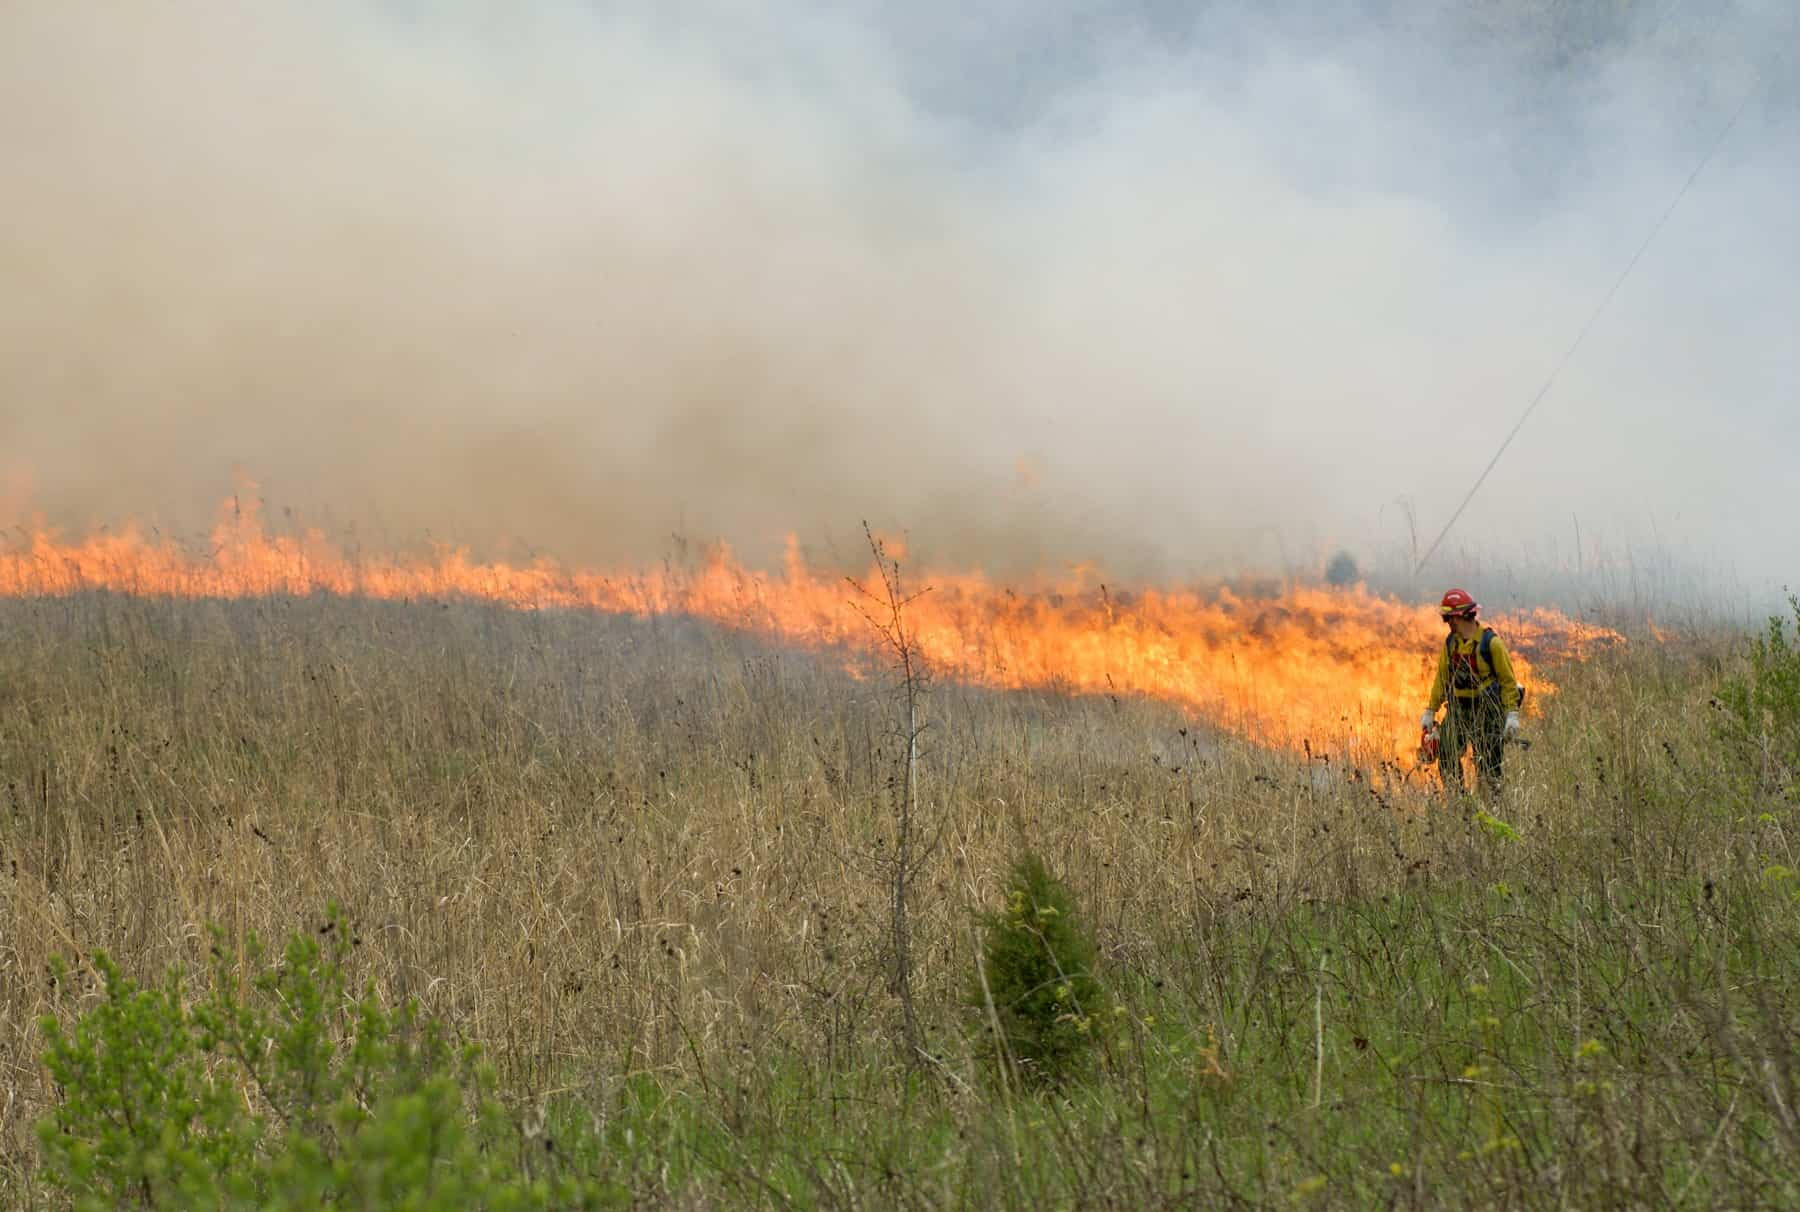 NPS employee in fire gear starting a prescribed burn along the lower St. Croix River. (Photo: NPS)